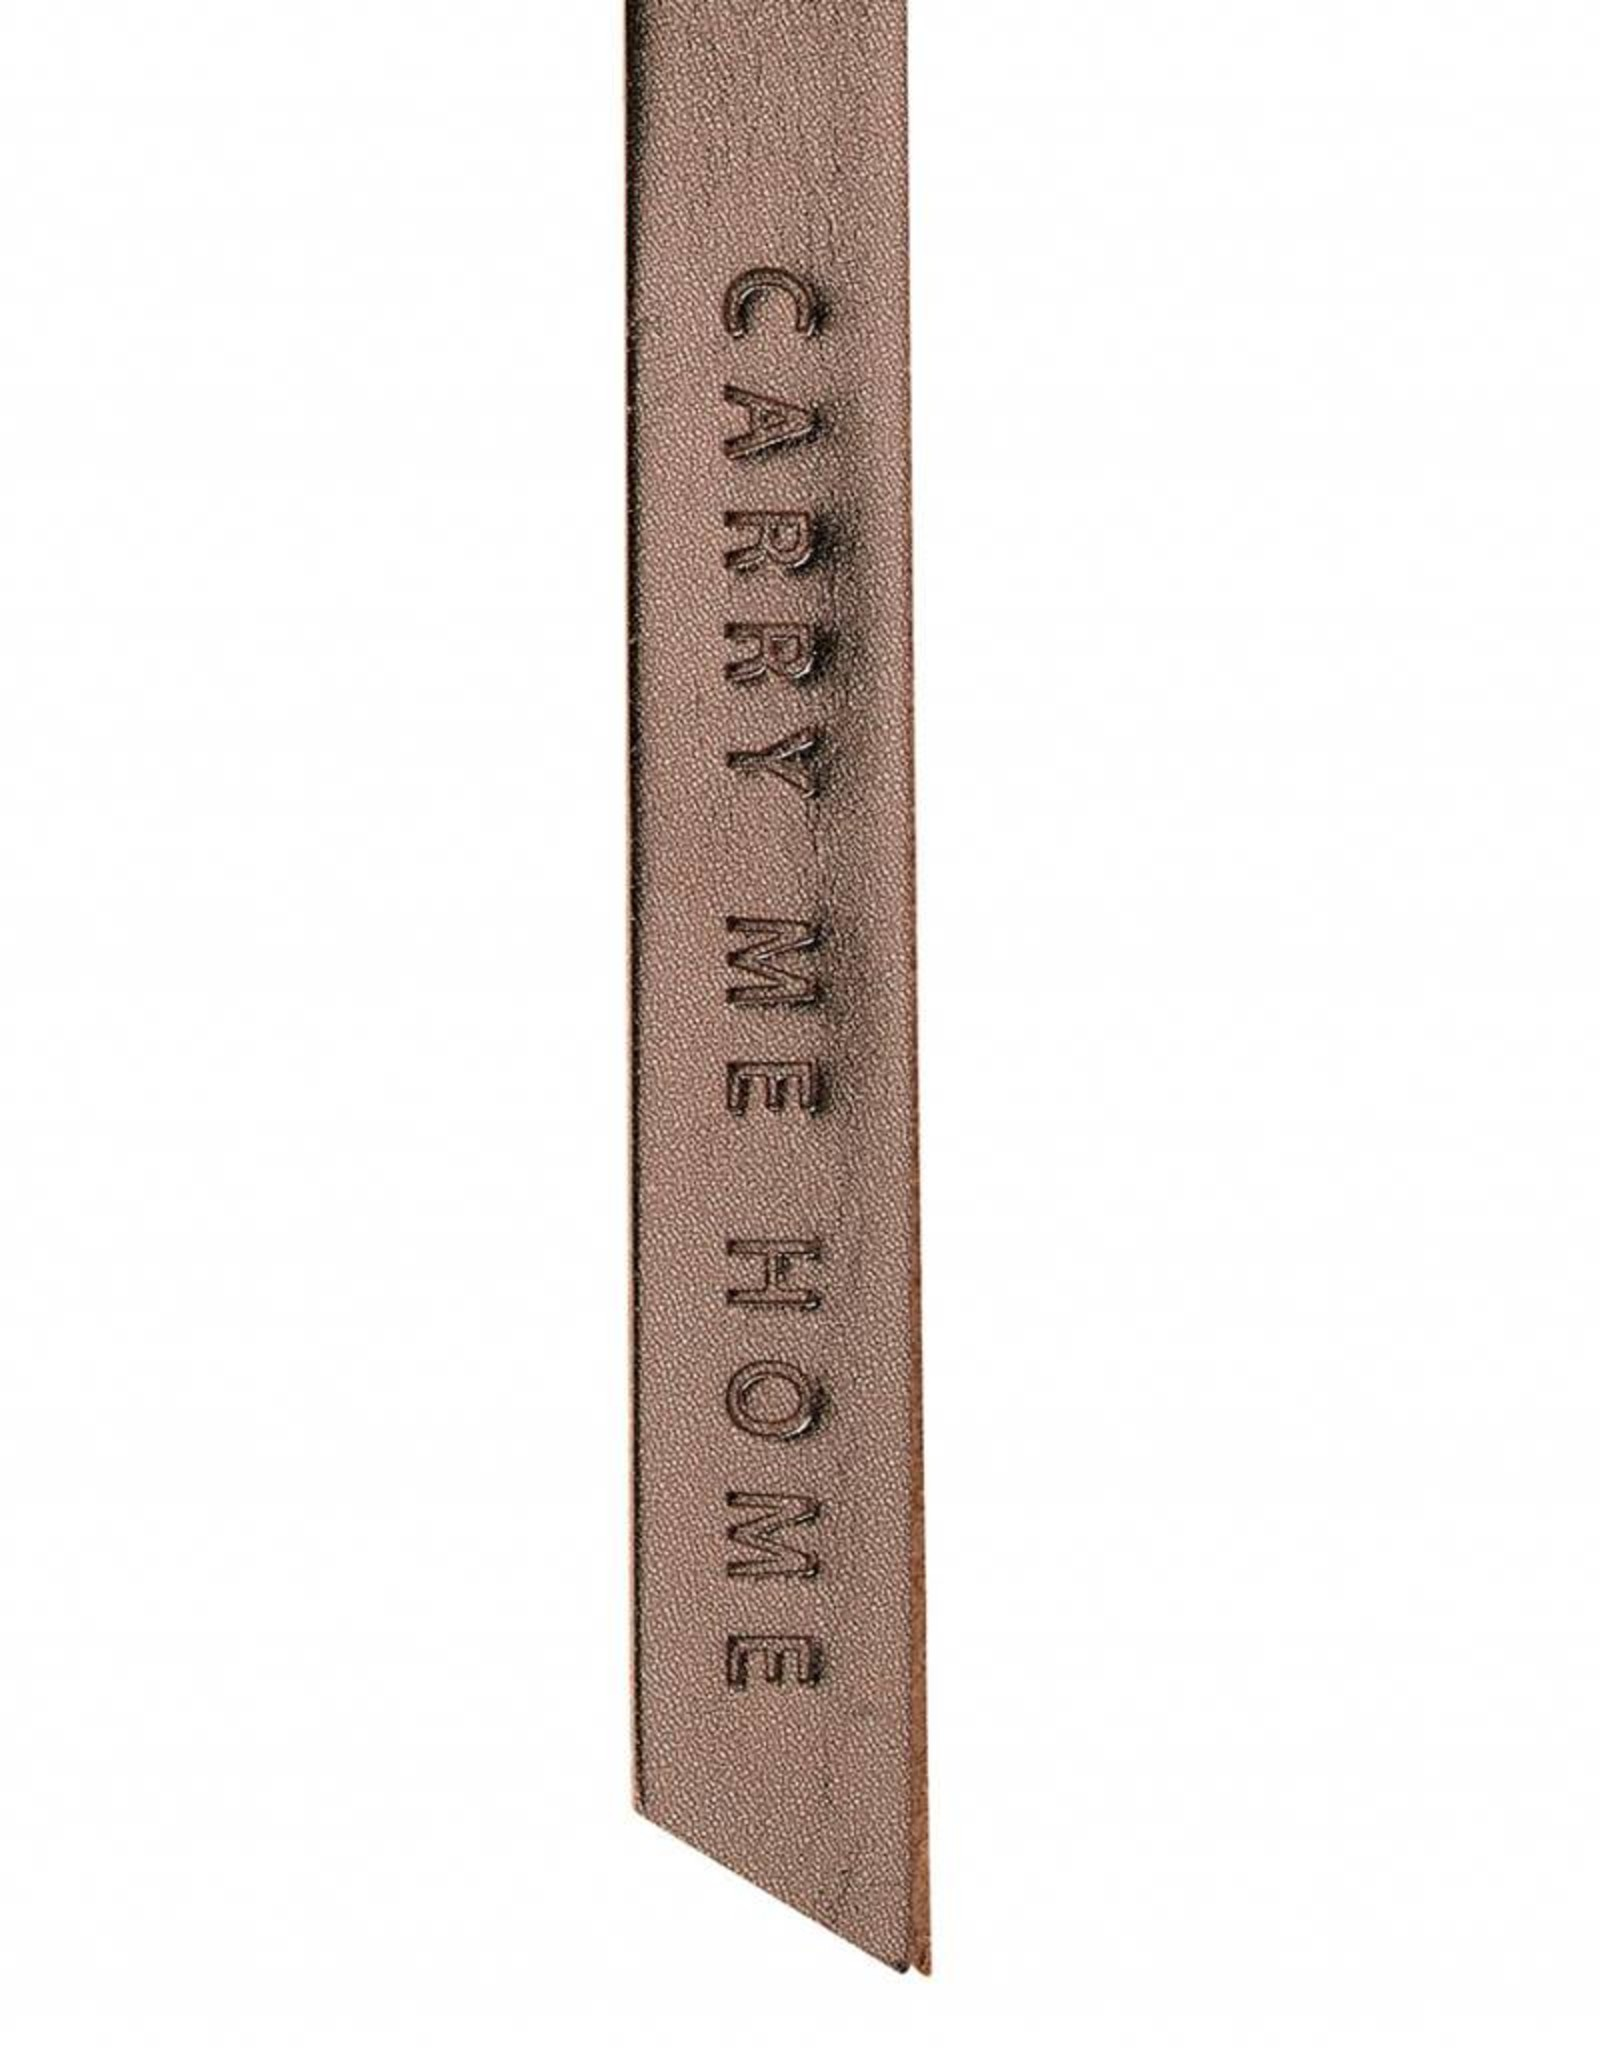 Räder Sleutelhanger Leather-bronze/carry me home